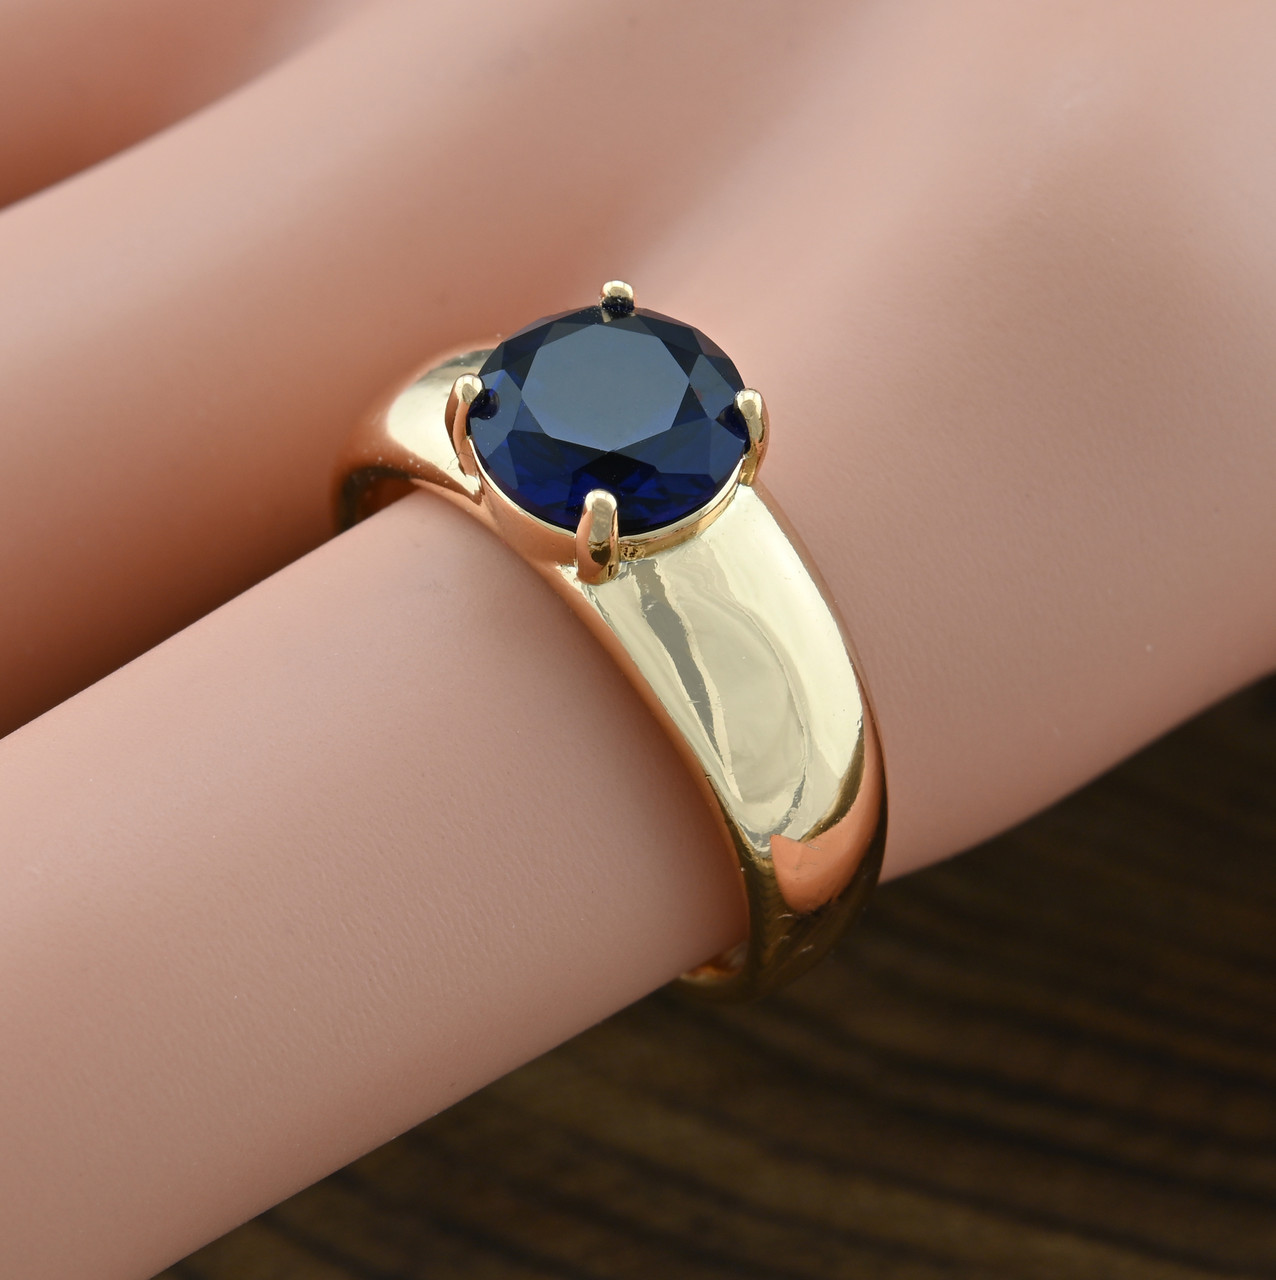 Кольцо Xuping 14289 размер 19 ширина 7 мм вес 4.6 г синие фианиты позолота 18К